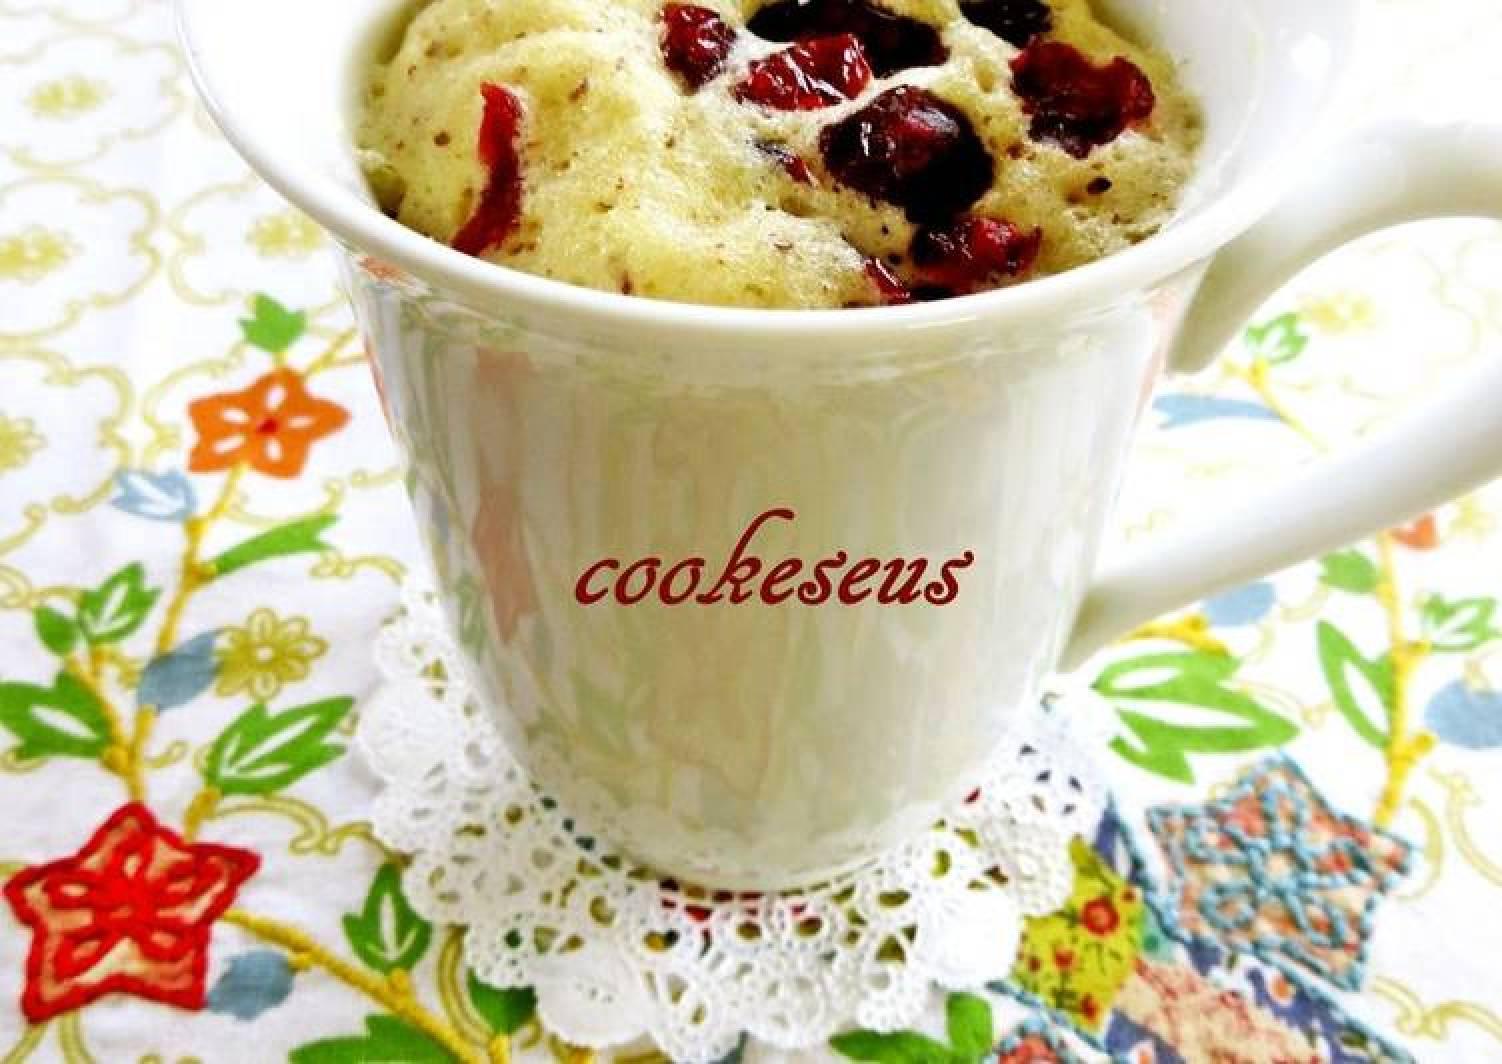 Microwave Cranberry Chocolate Cupcake in a Mug